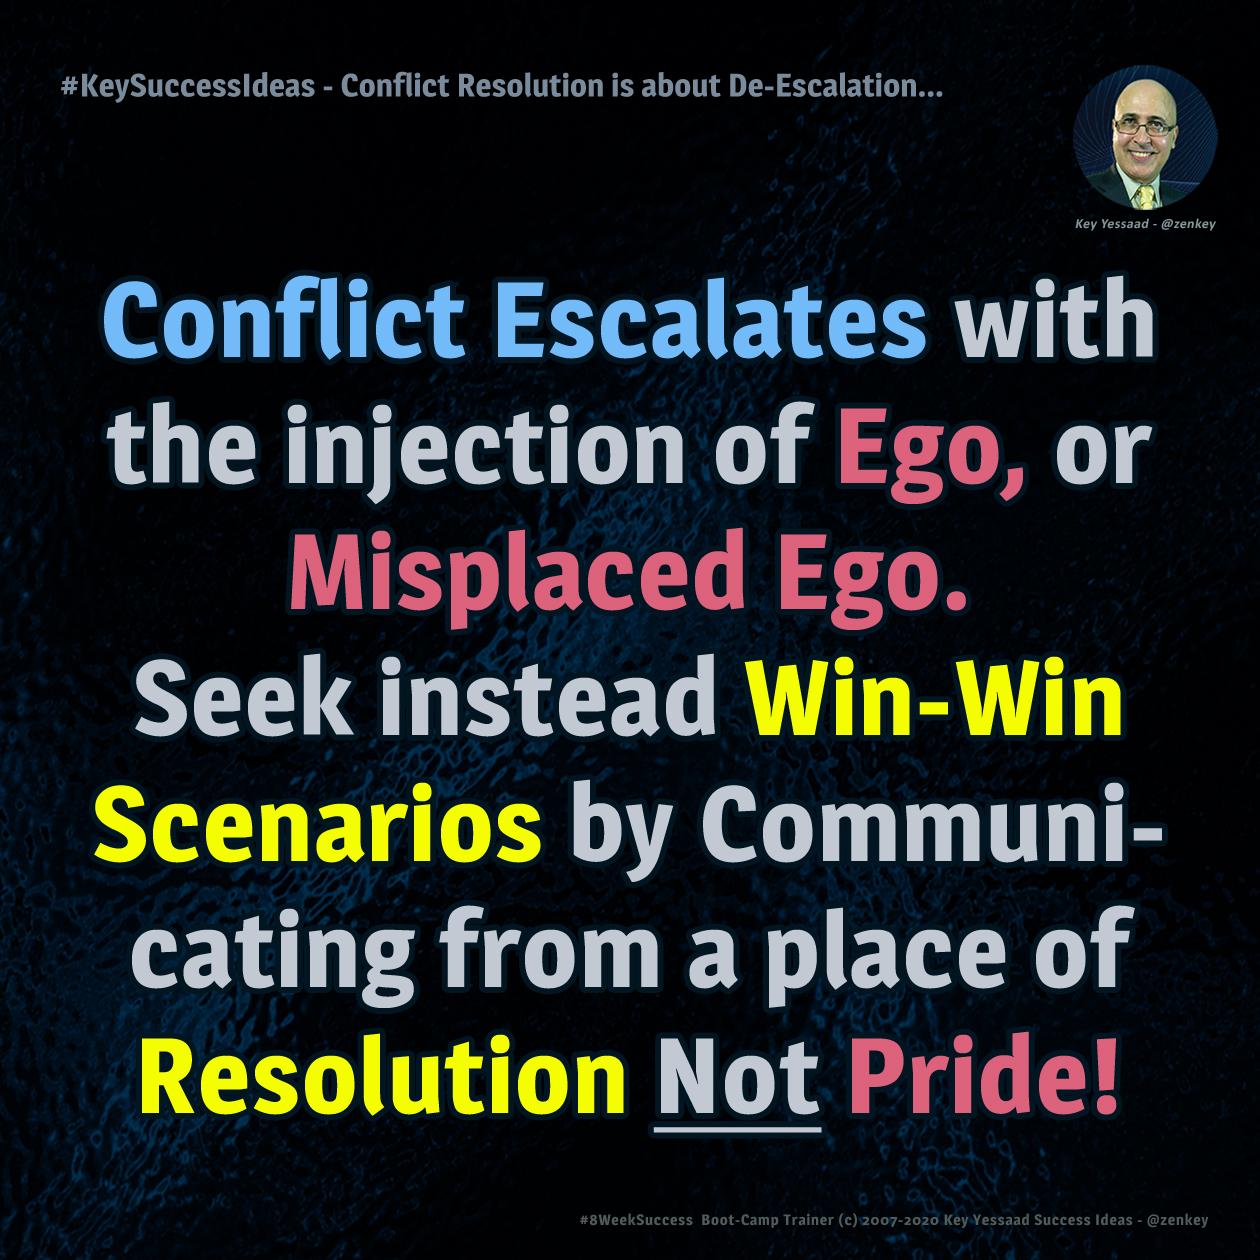 Conflict Resolution is about De-Escalation... - #KeySuccessIdeas